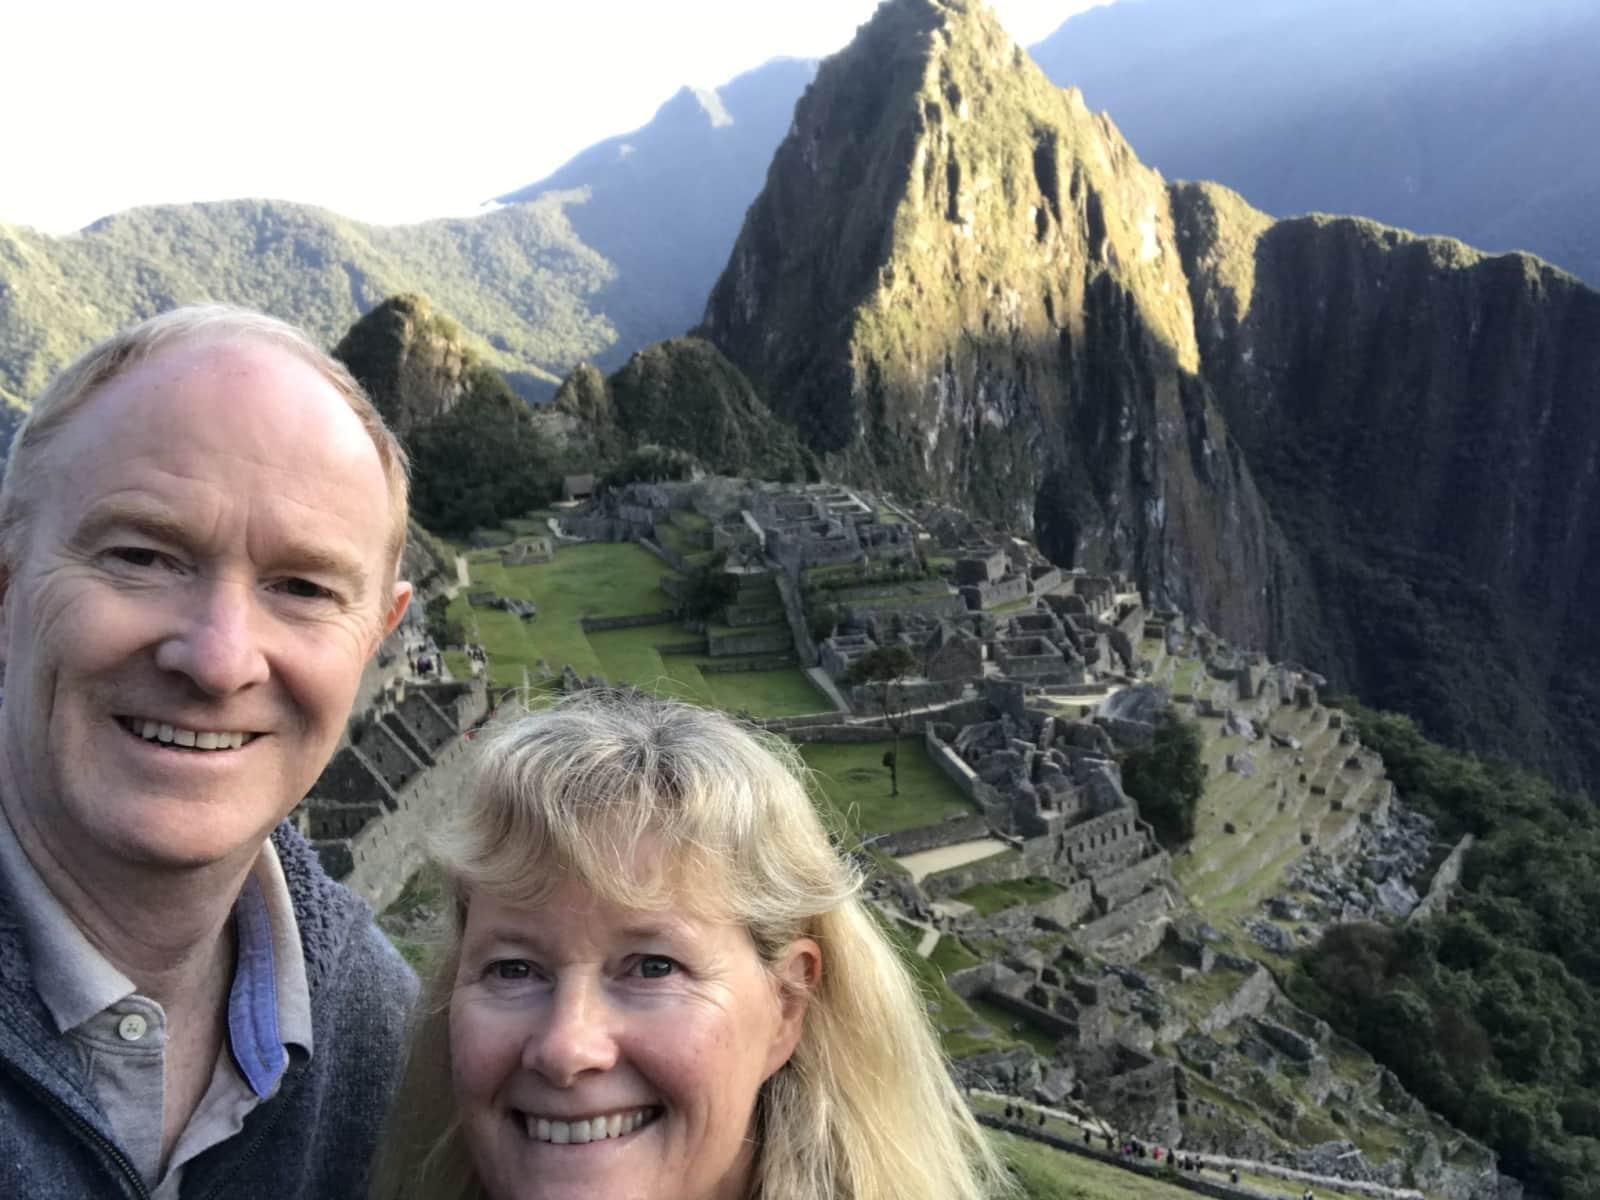 Neil & Helen from Dublin, Ireland